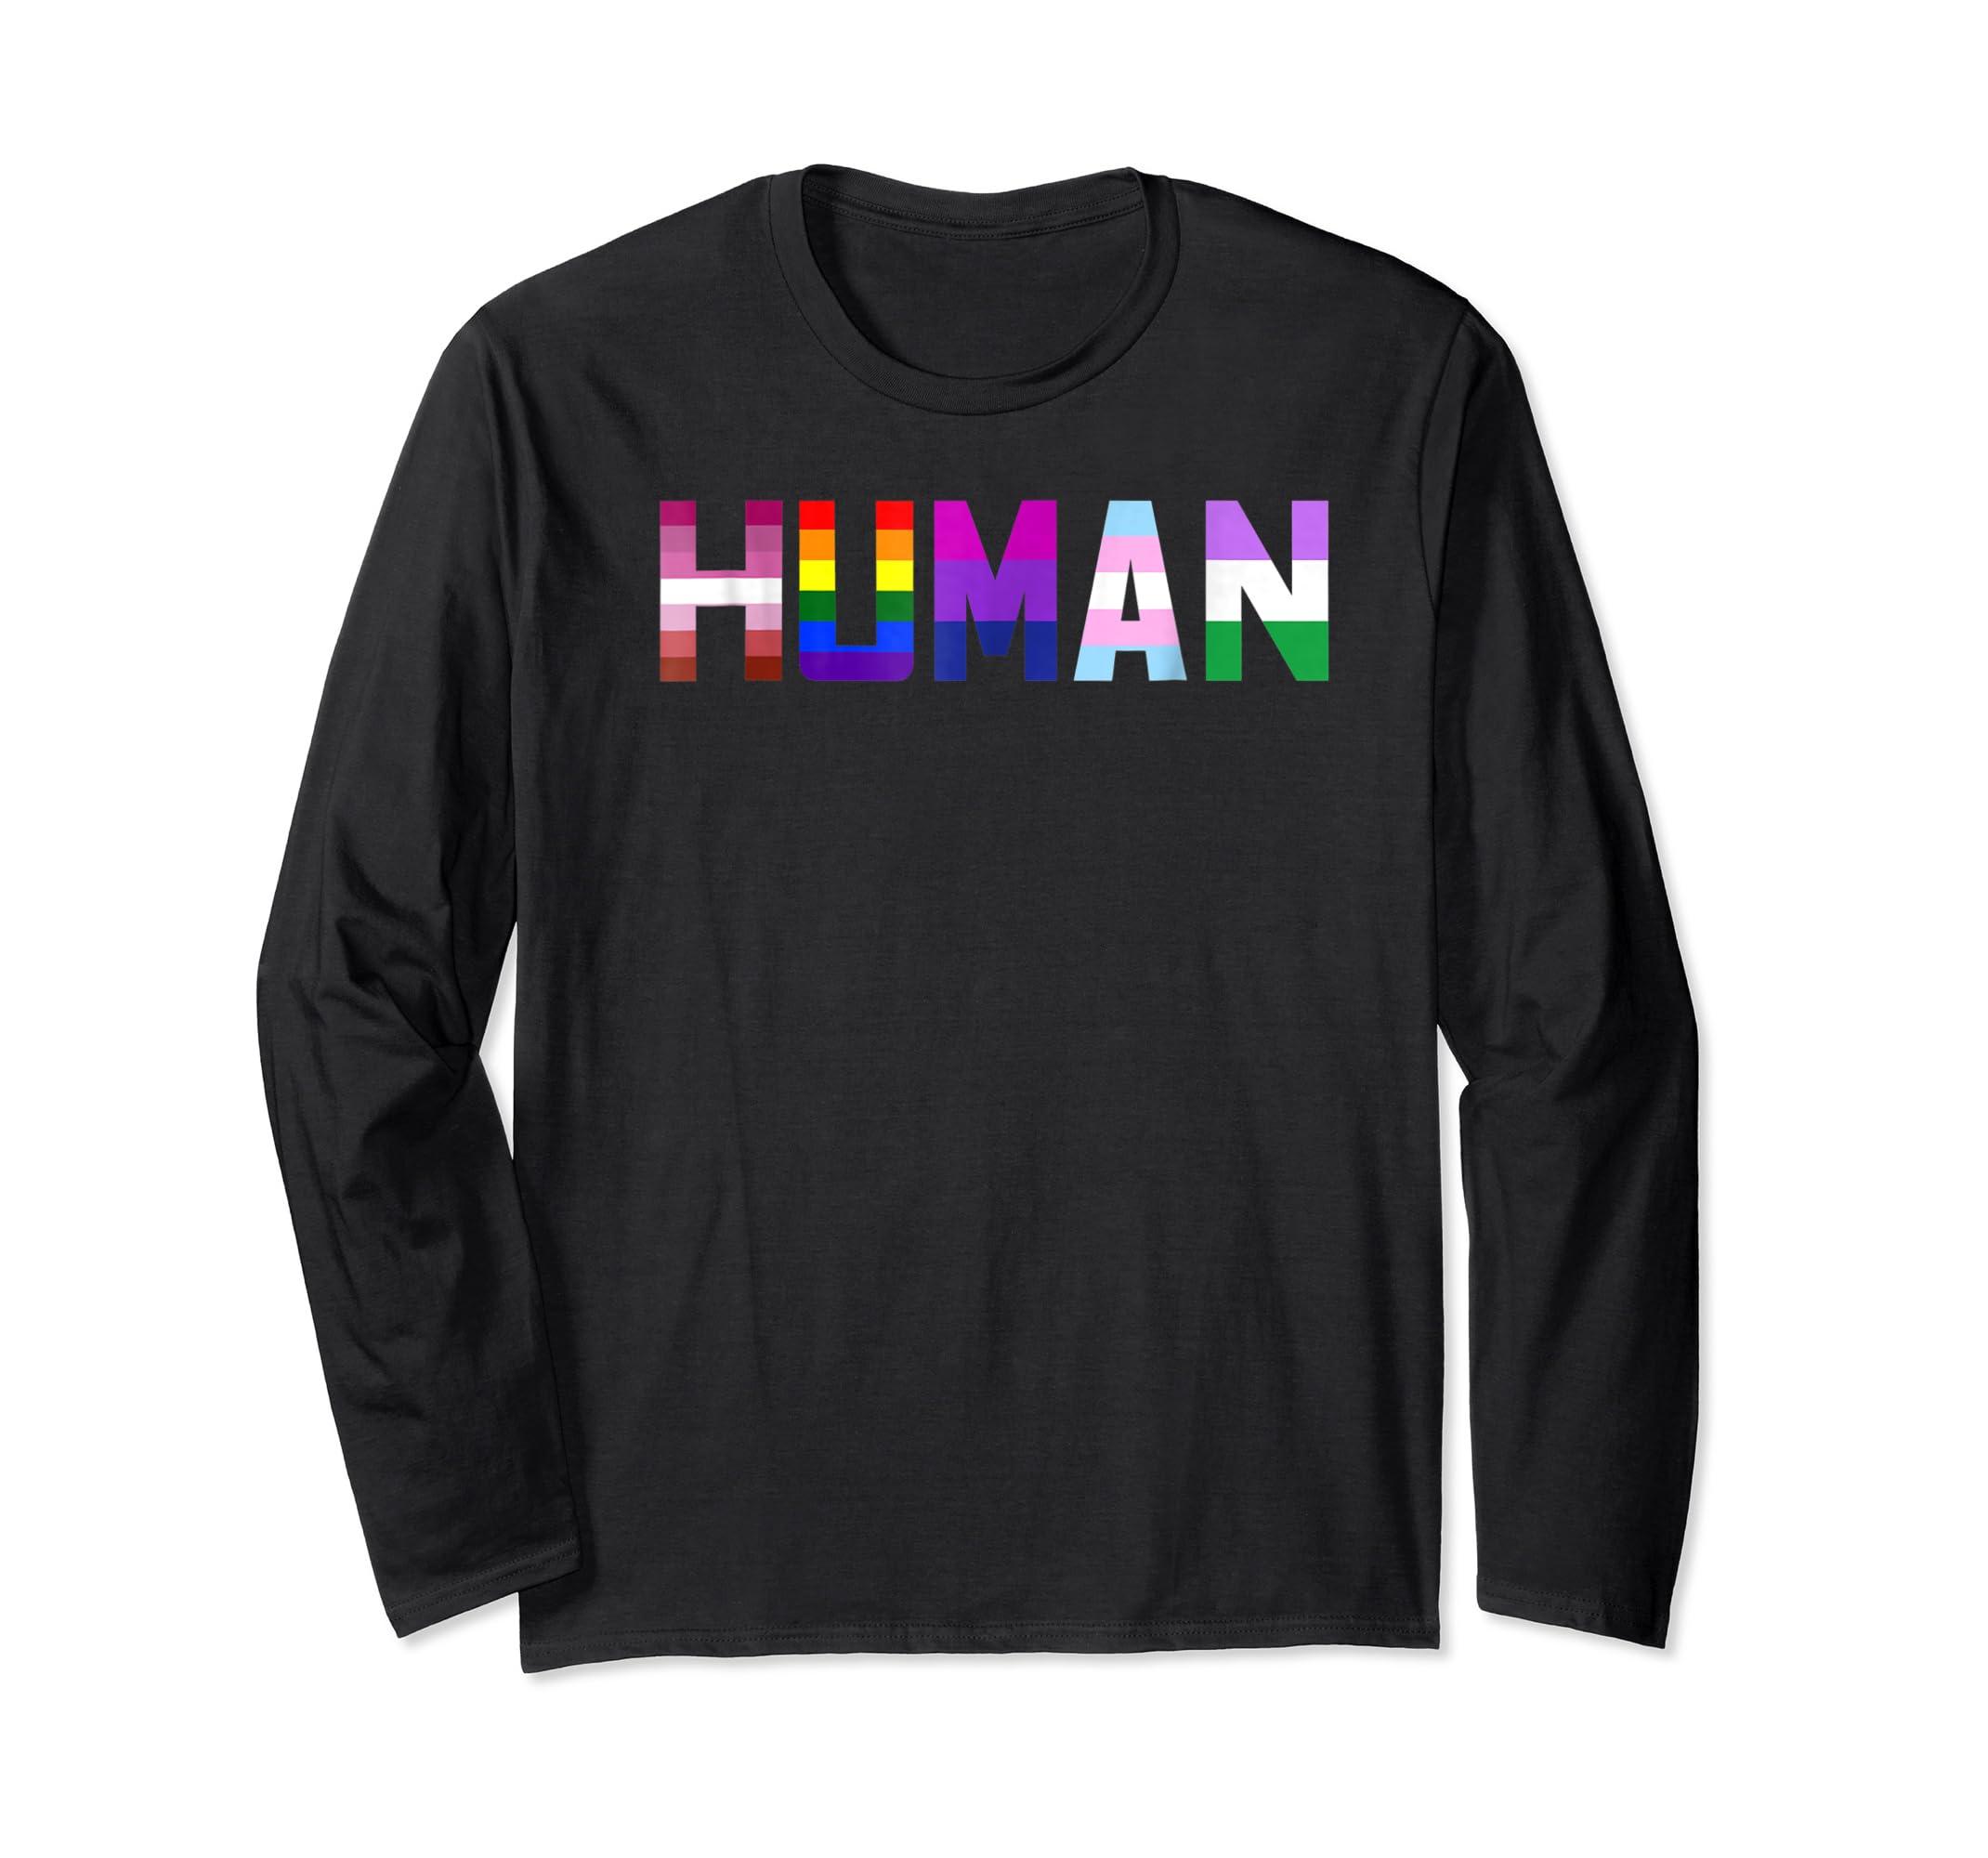 HUMAN Flag LGBT Gay Pride Month Transgender Ally T Shirt-Long Sleeve-Black